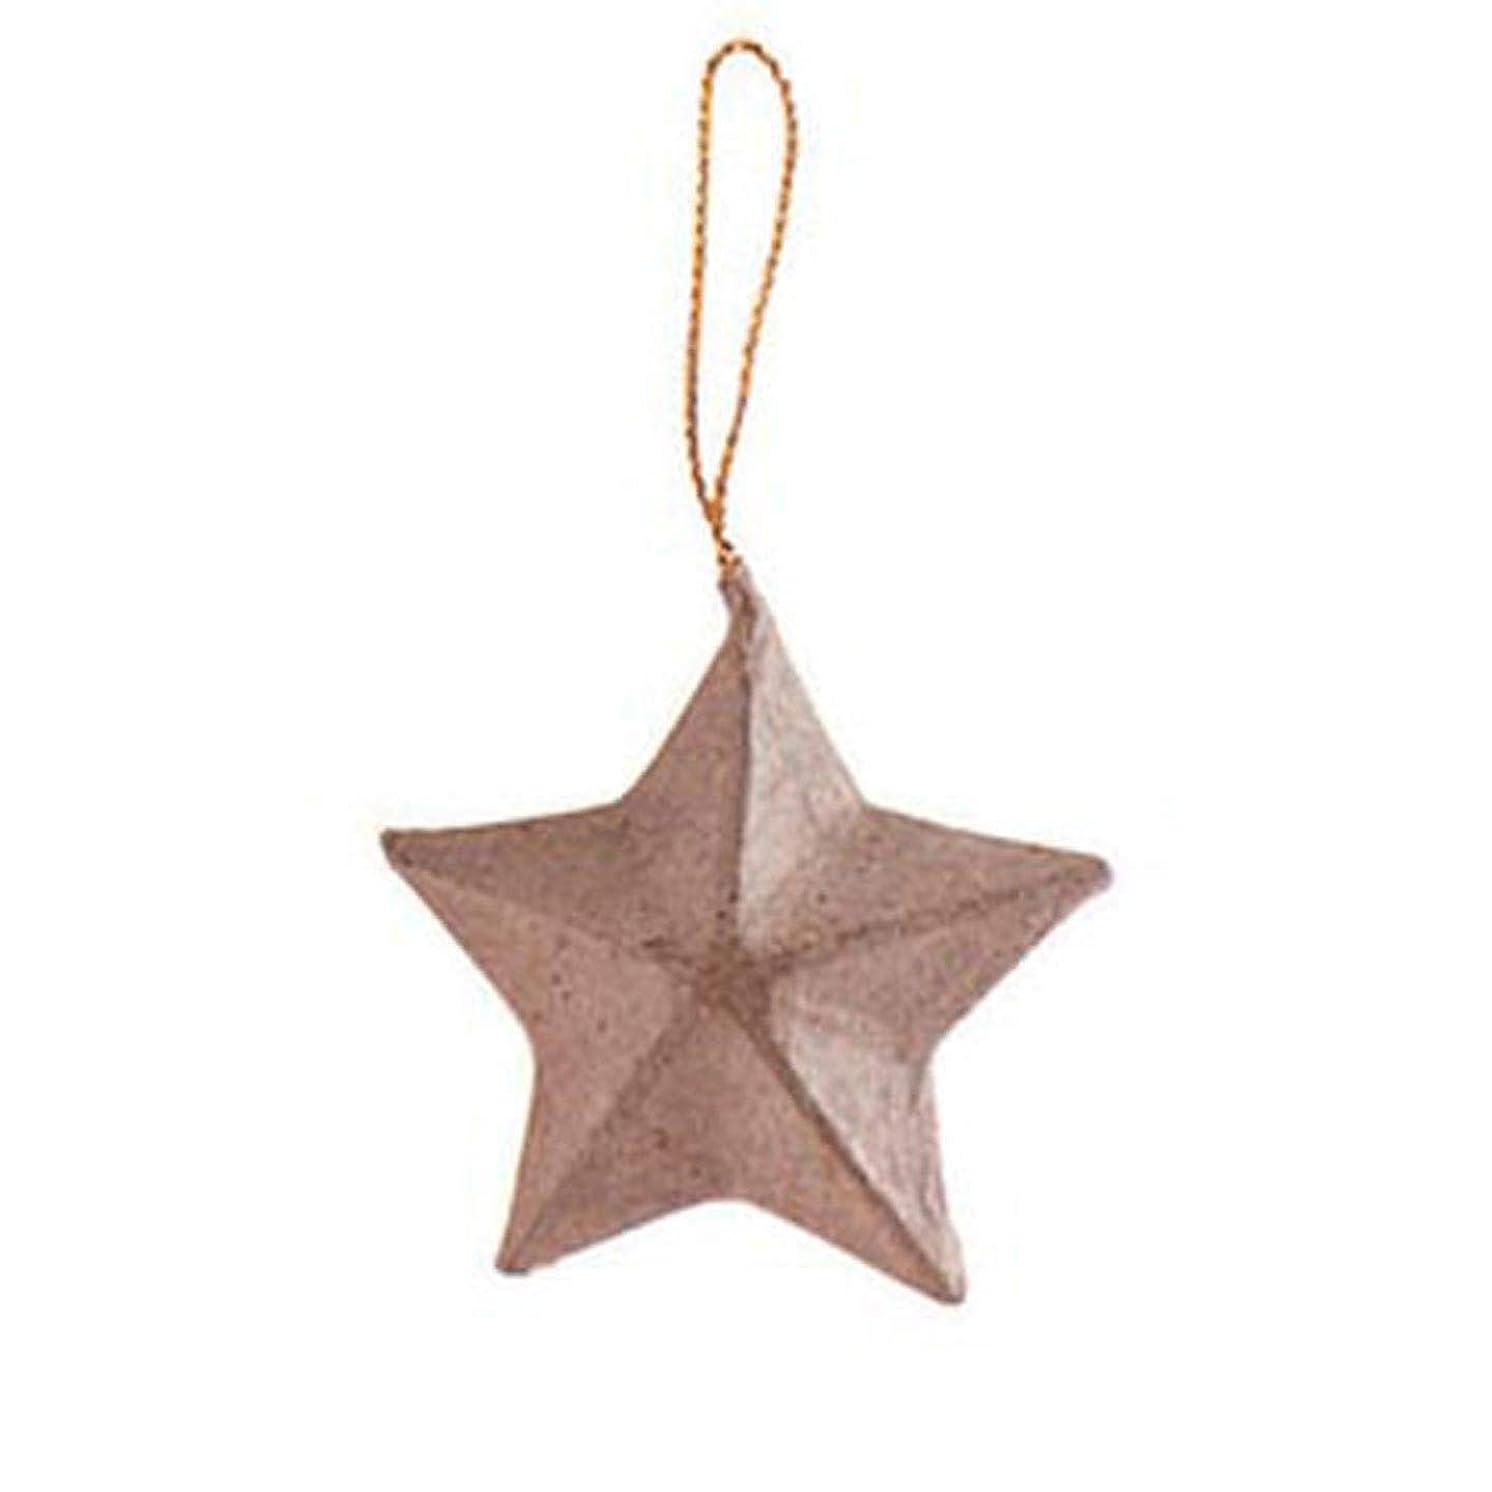 Bulk Buy: Darice DIY Crafts Paper Mache Ornament Star 2 inches (12-Pack) 2833-60